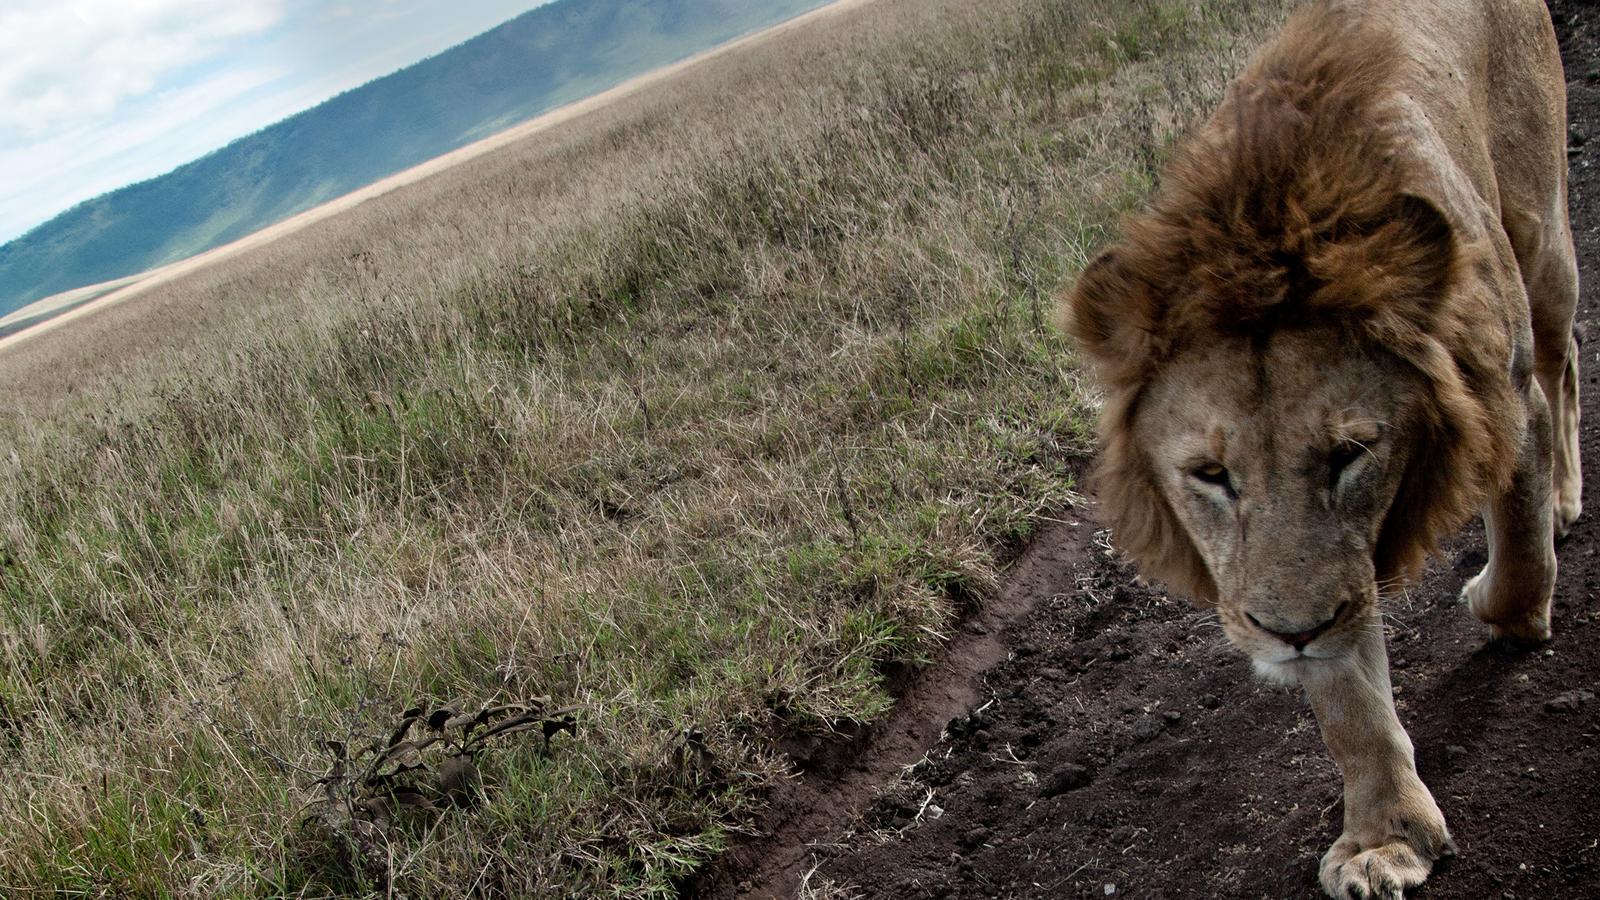 Tansania Heißluftballon traveljunkies Safari Game Drive Gruppenreise Erlebnisreise Afrika Abenteuerreise Great Migration Ngorongoro Krater Serengeti Nationalpark Reisen für junge Leute